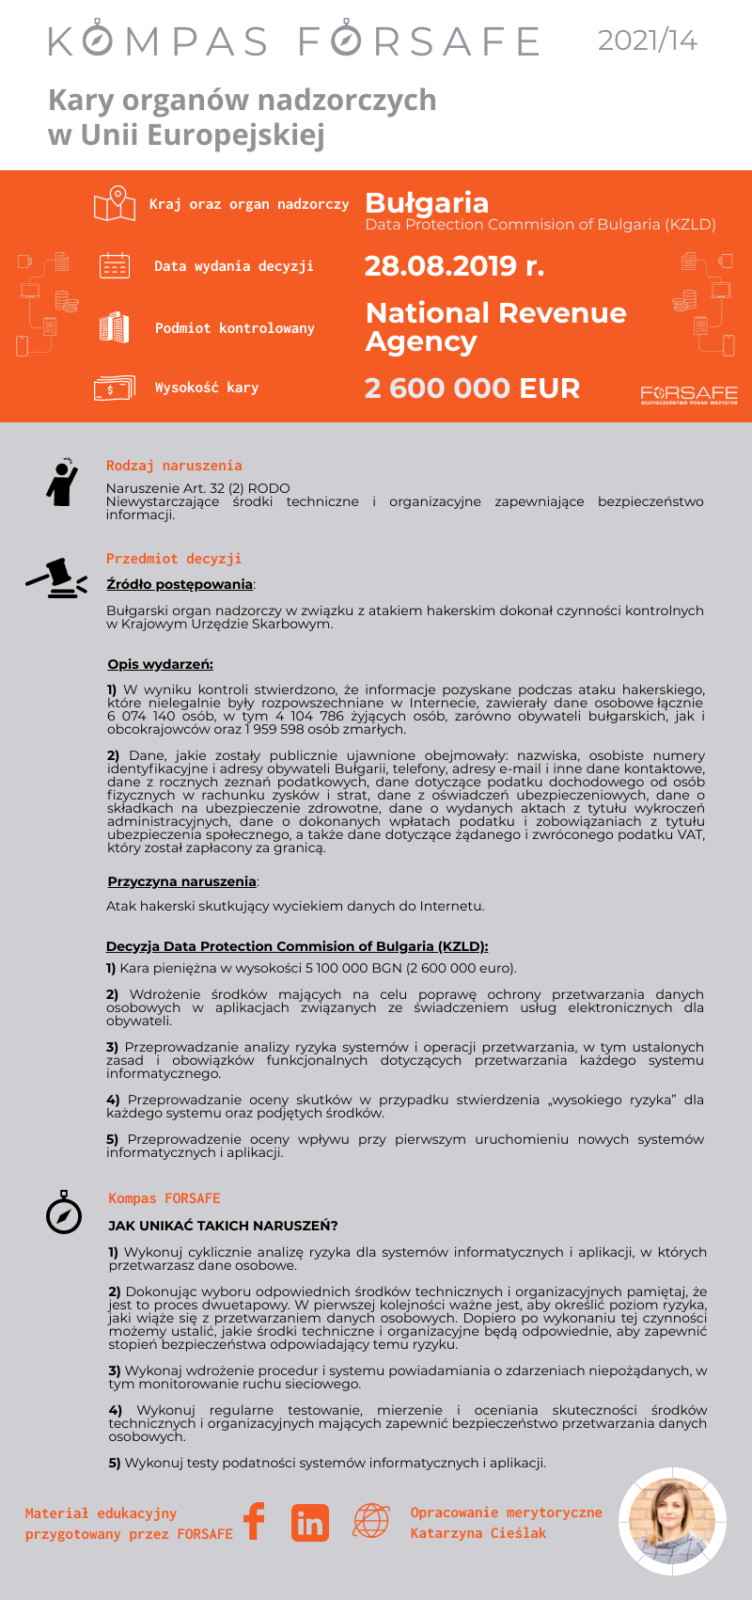 Kompas FORSAFE EU 2021 14 KOMPAS FORSAFE EU 2021/14 - Kara dla Narodowej Agencji ds. Dochodów w Bułgarii